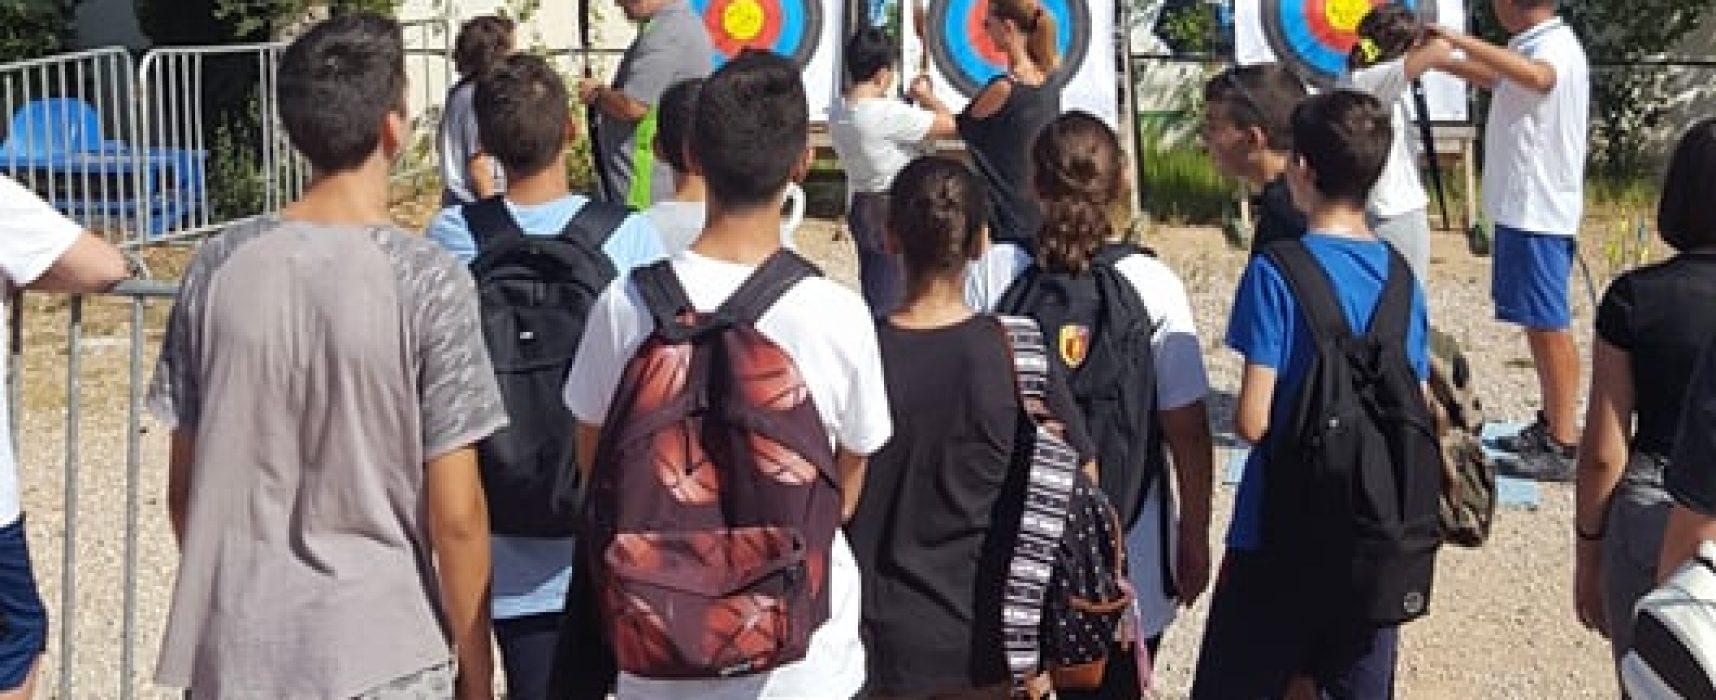 Oι μαθητές γνώρισαν την τοξοβολία στο Ο.Α.Κ.Α.